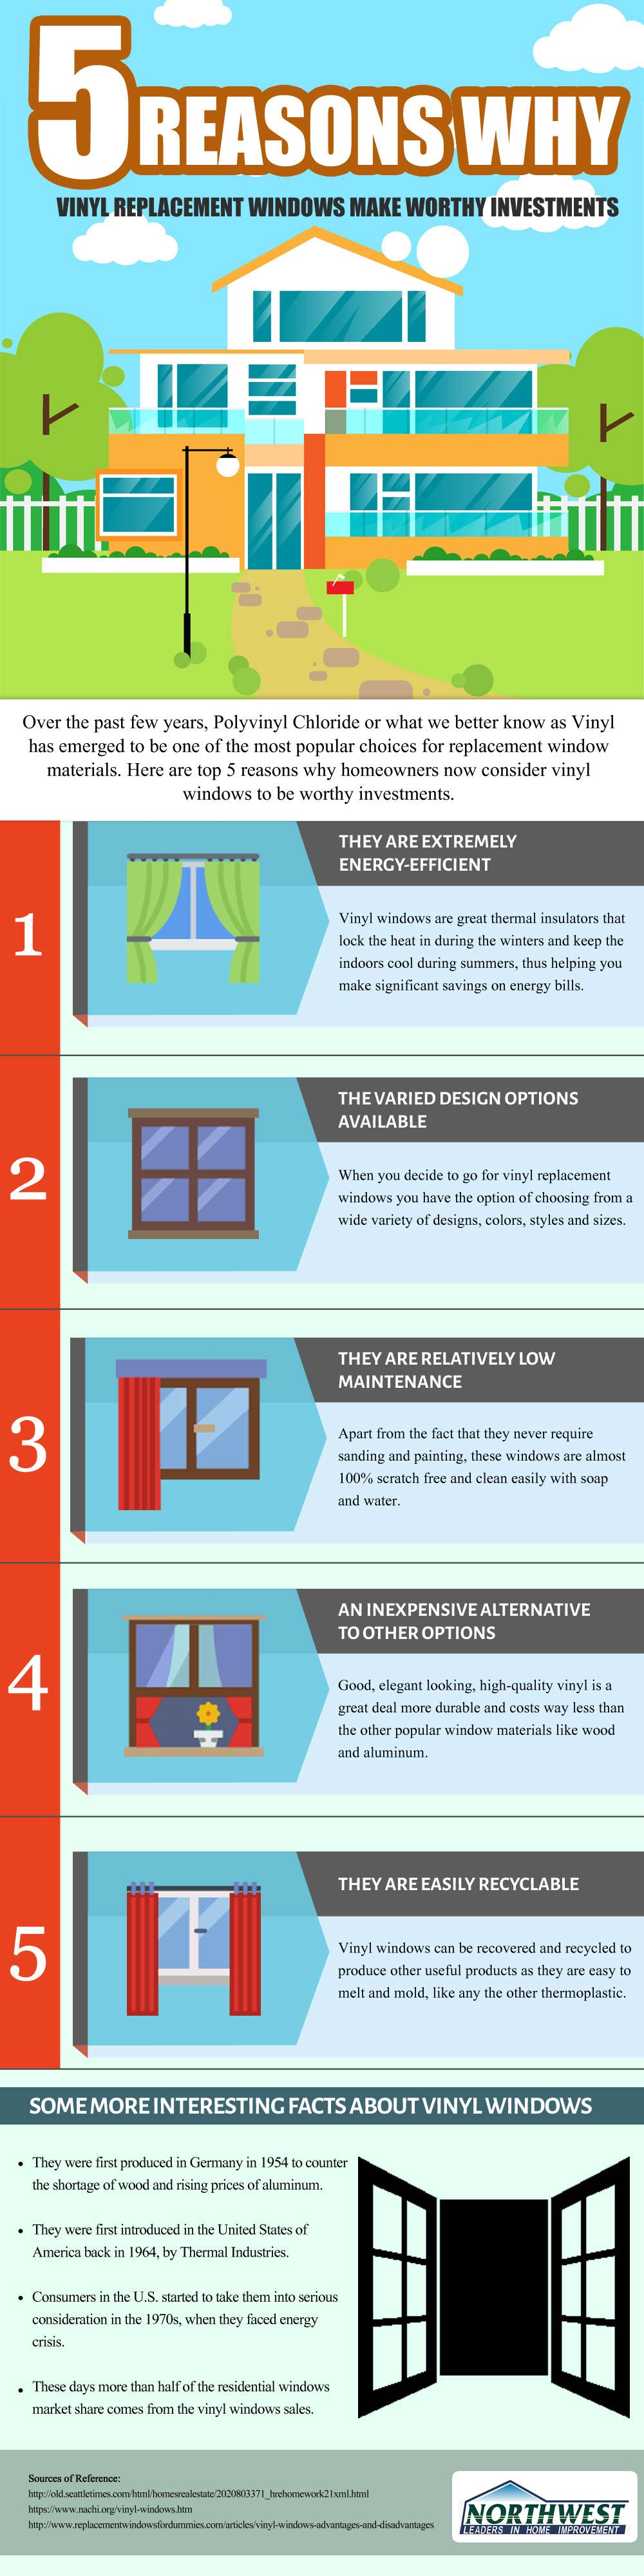 Northwest Exterior 5 Reasons to Use Vinyl Replacement Windows